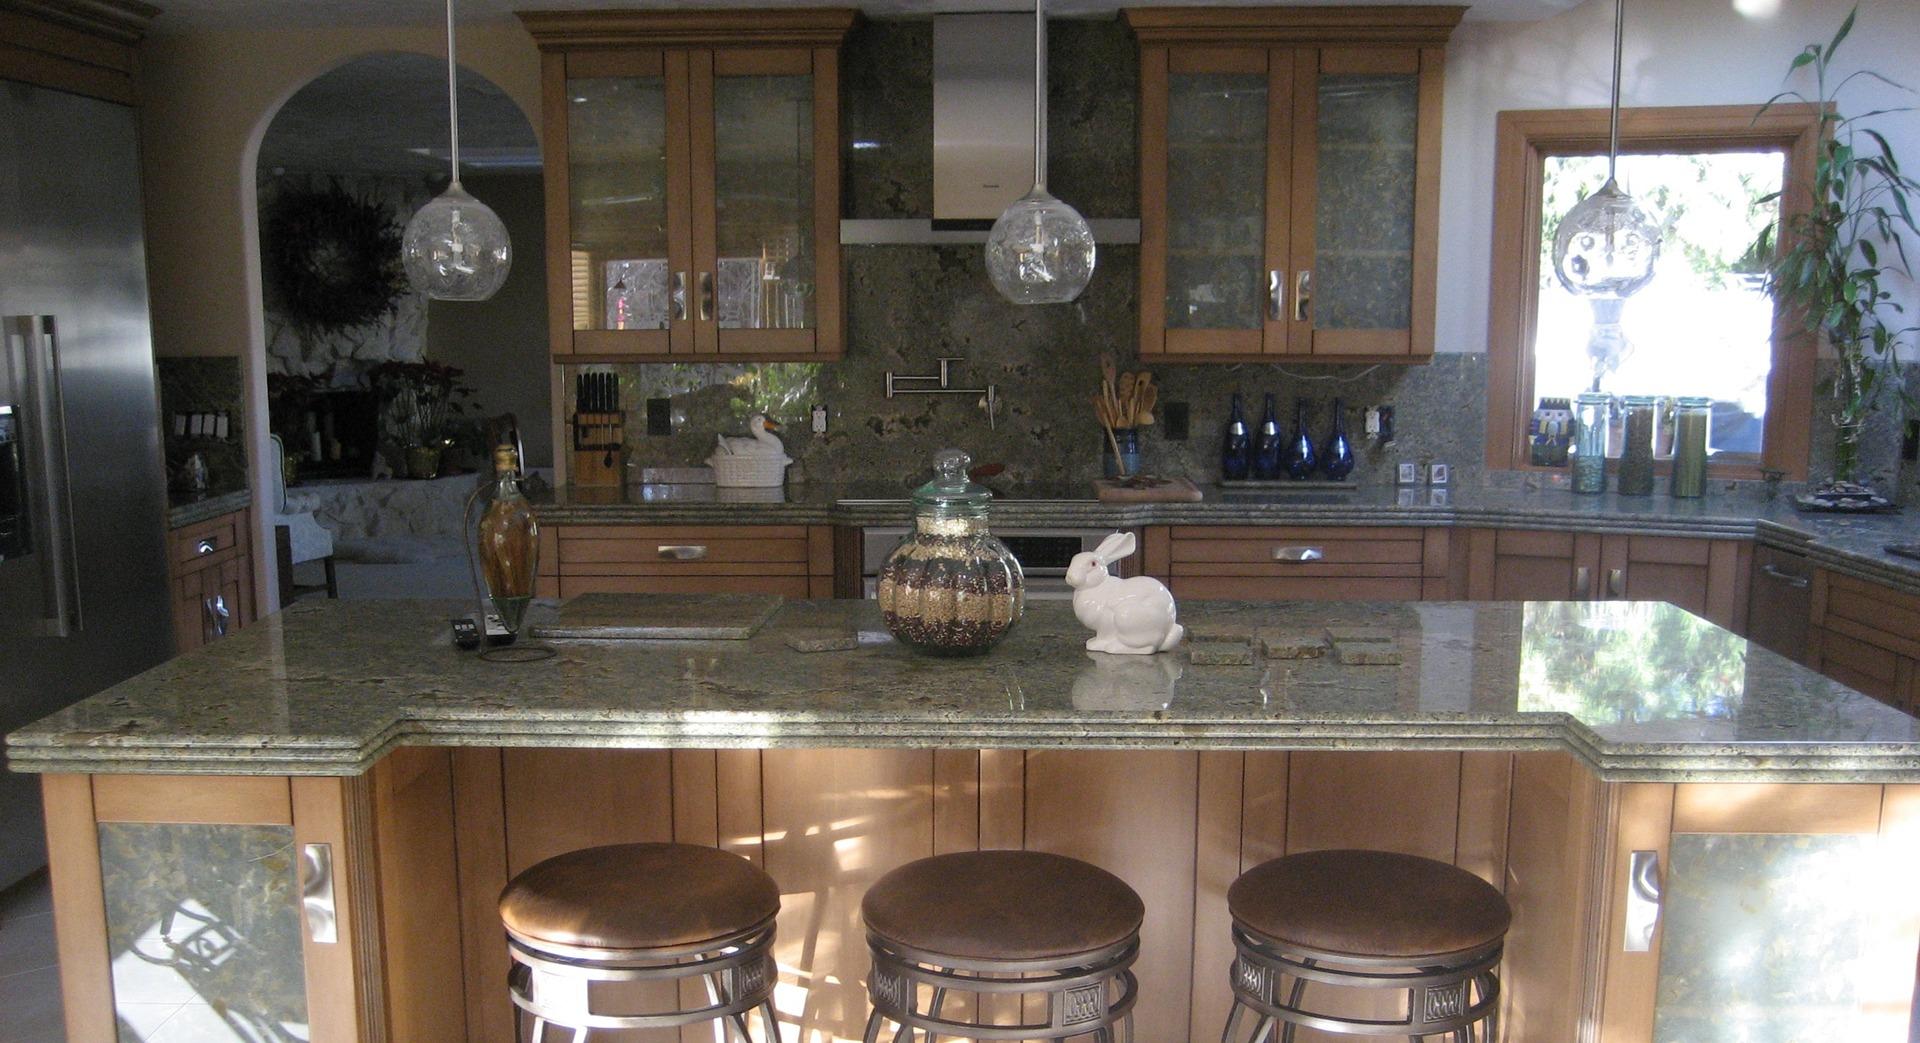 Kitchen Cabinets Las Vegas |Showroom|Artizen Full Access Cabinets